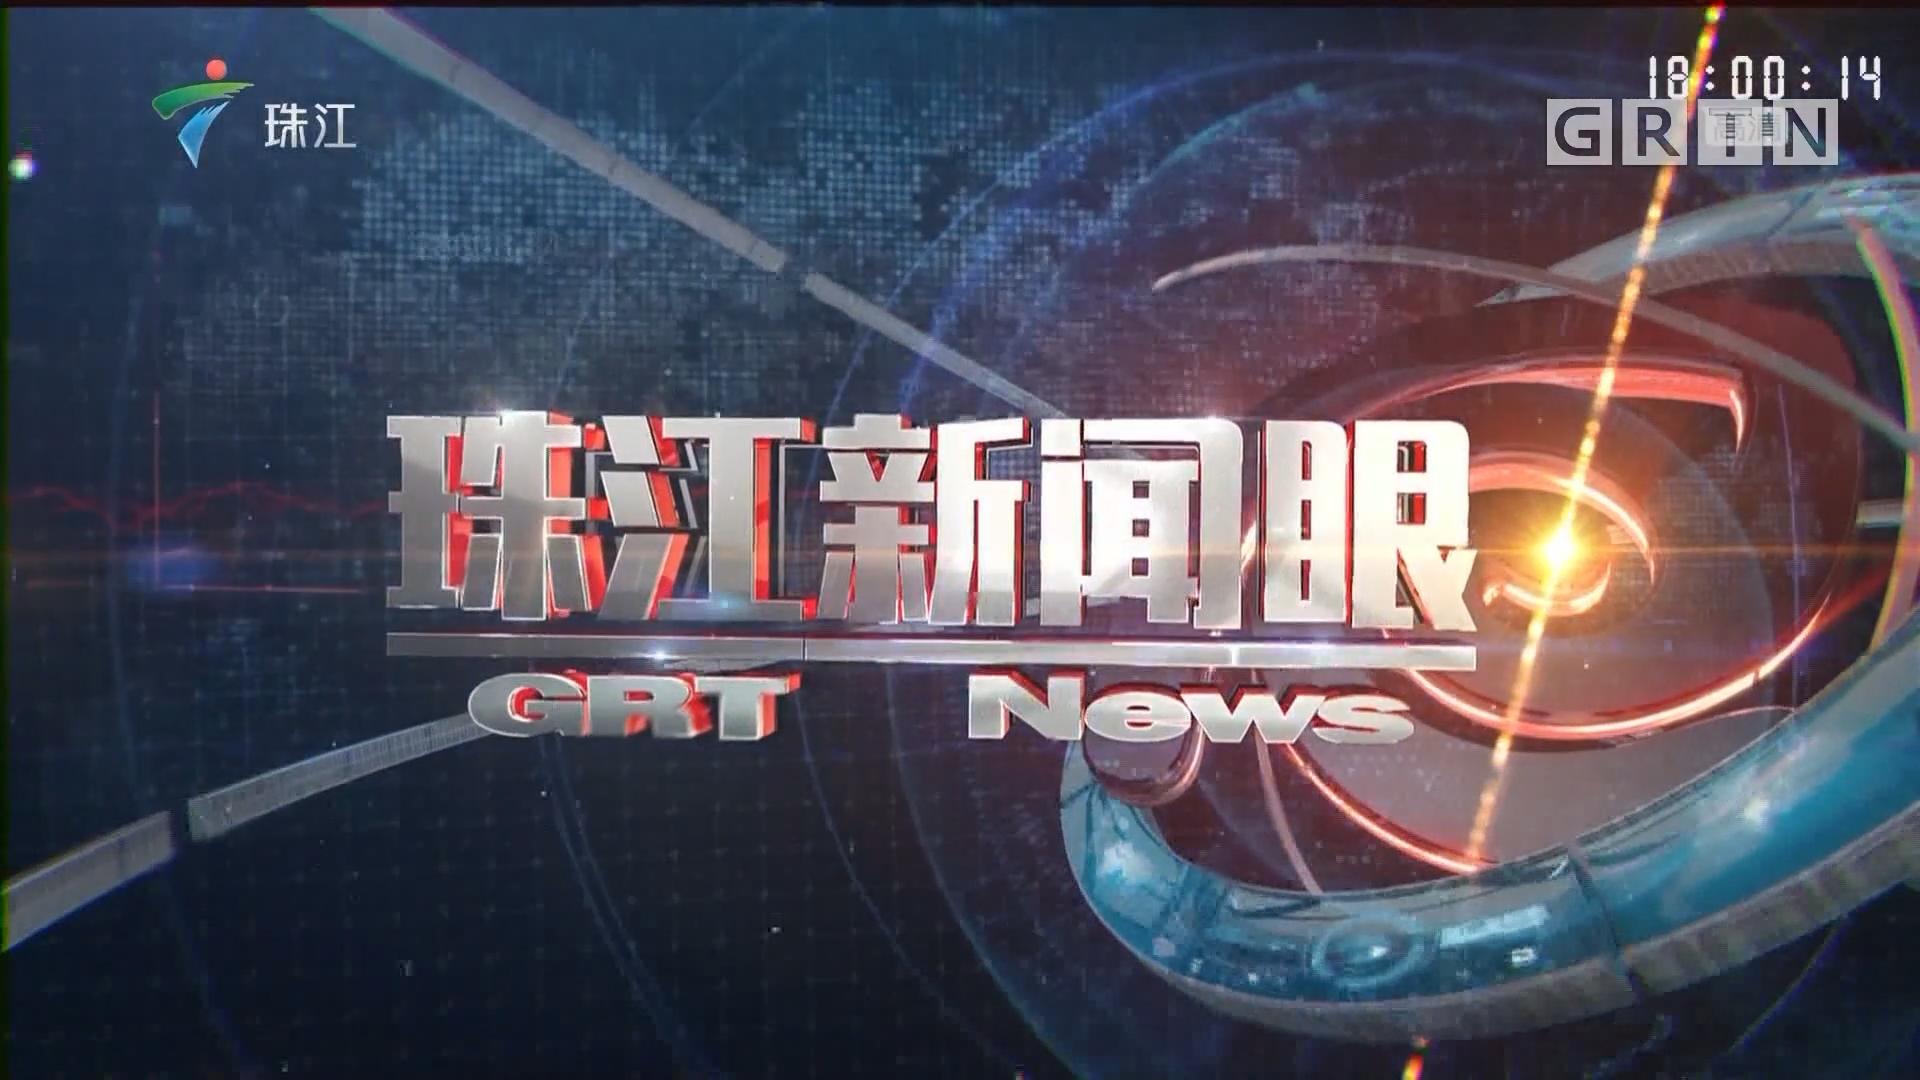 [HD][2018-12-13]珠江新闻眼:上海:淞沪抗战纪念馆举行公祭活动